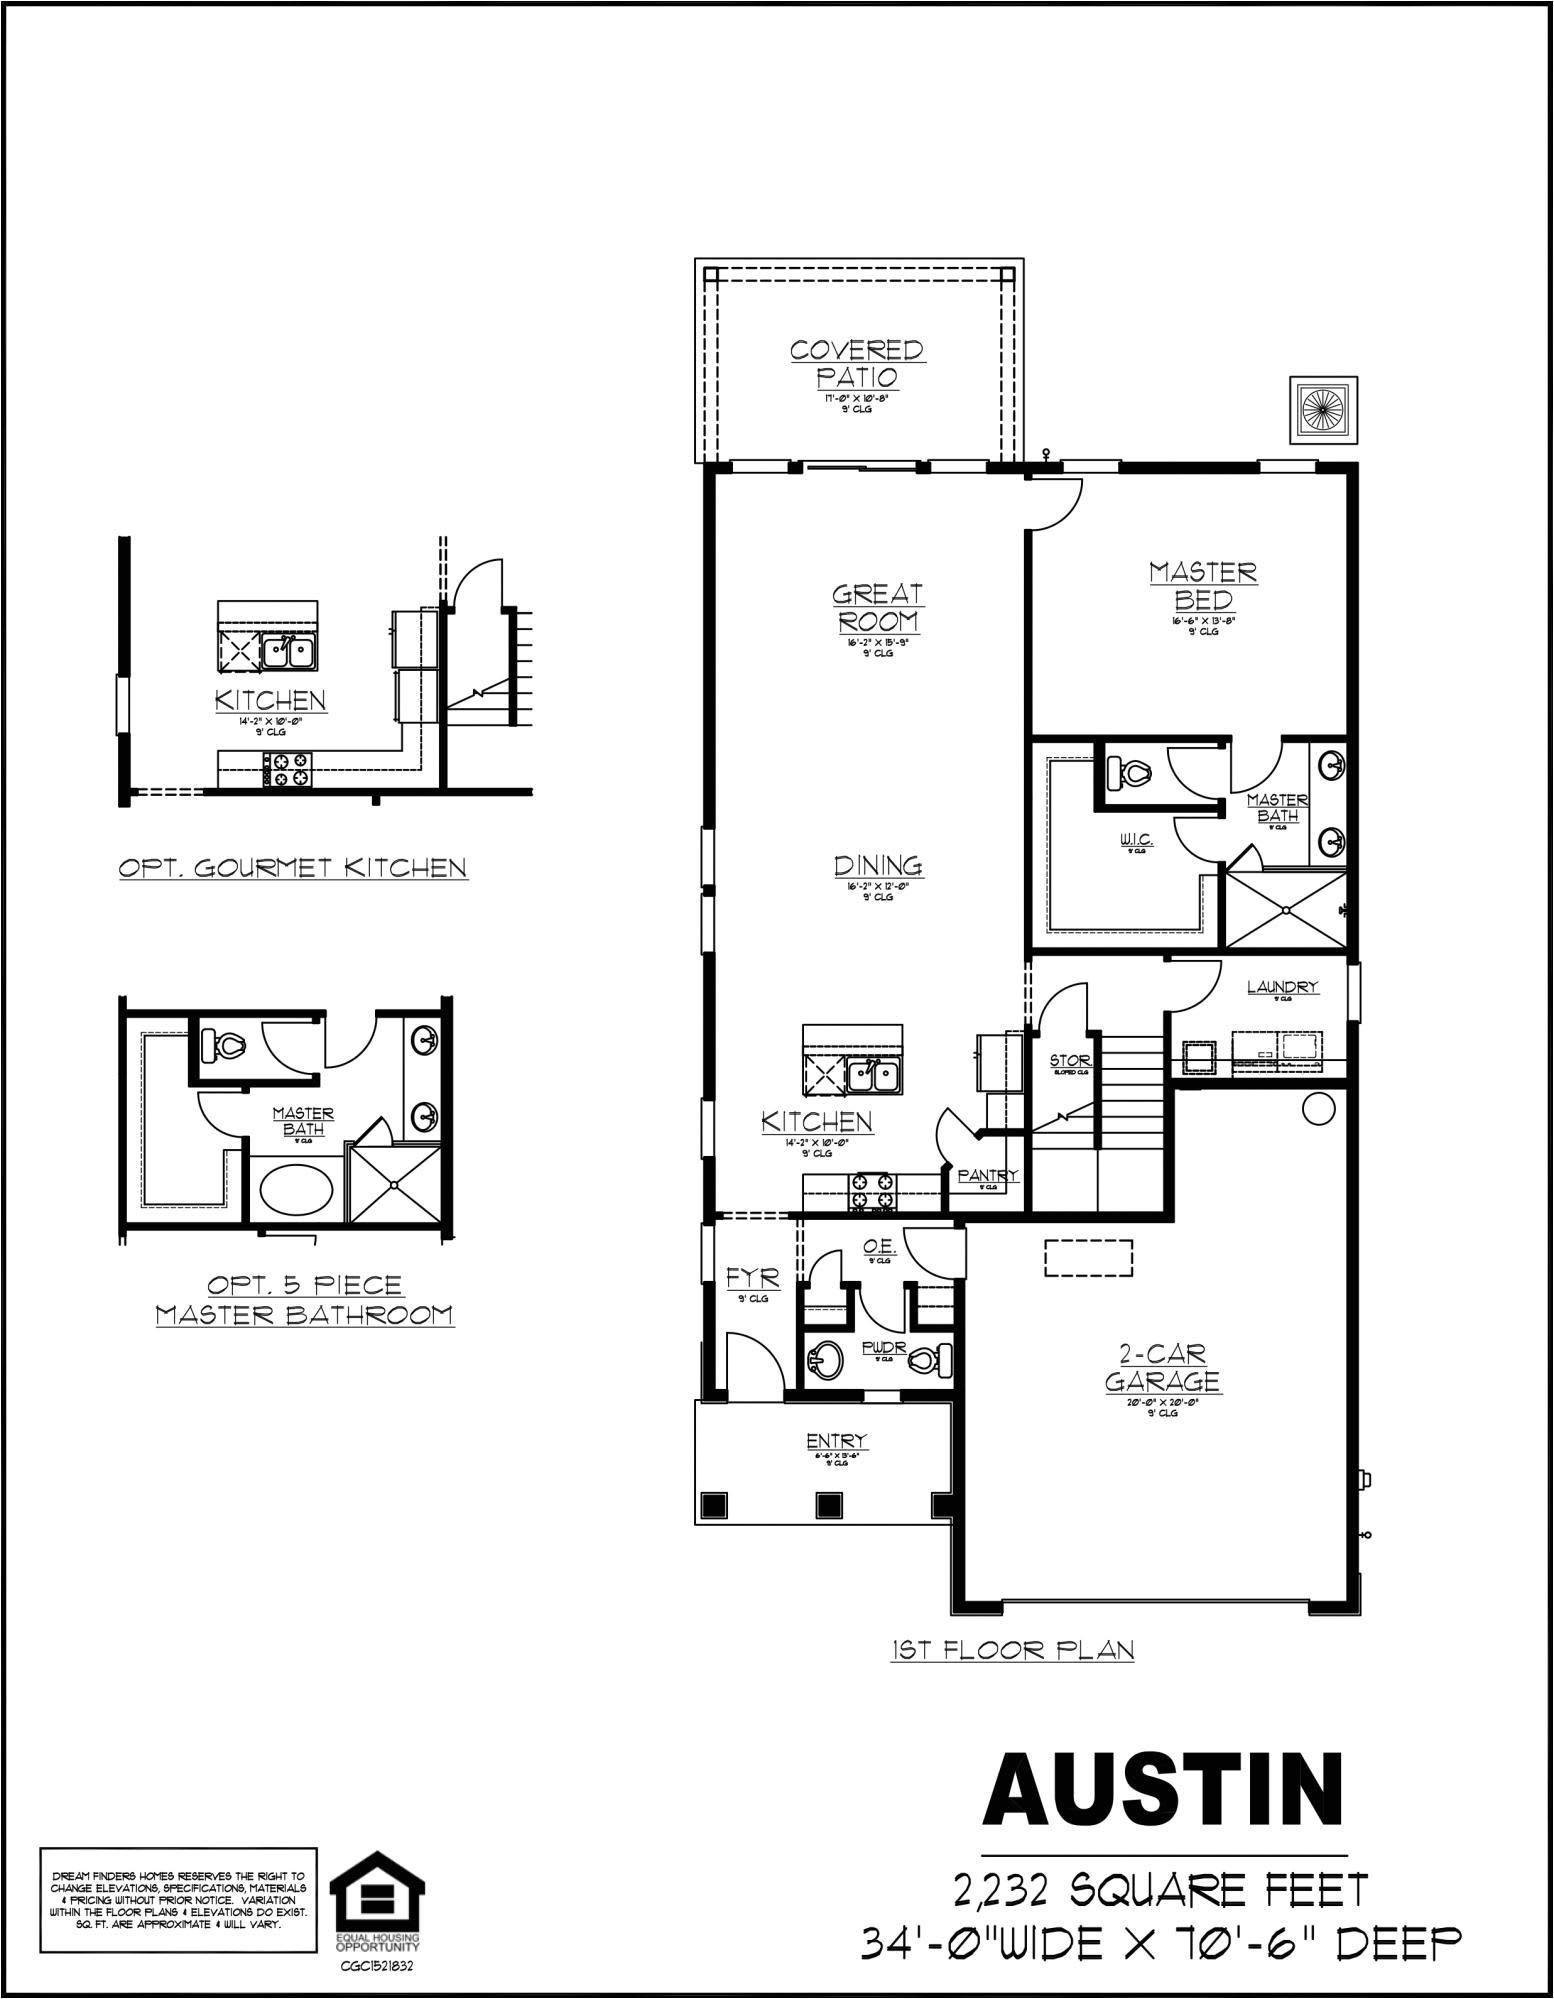 370035252533853 austin floor plan 1 2